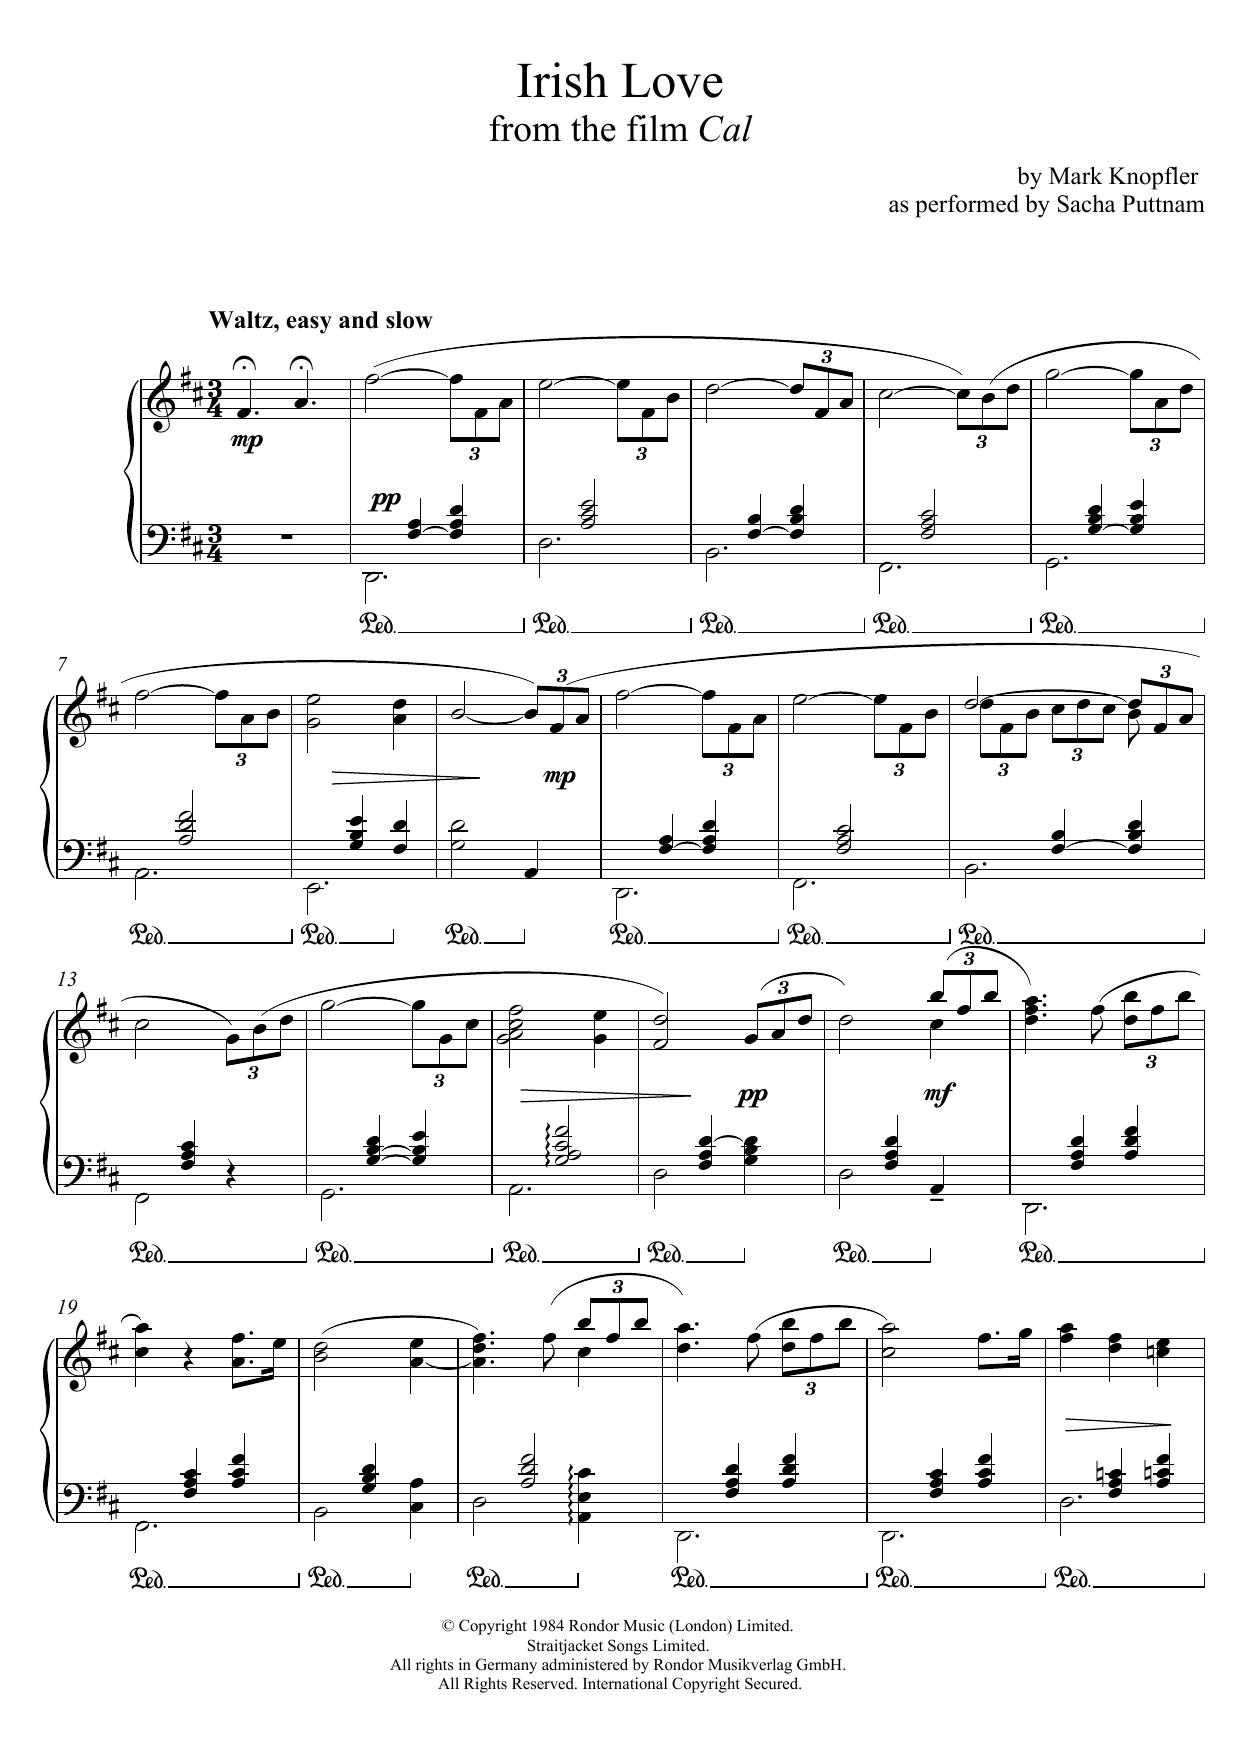 Irish Love (from Cal) (as performed by Sacha Puttnam) Sheet Music